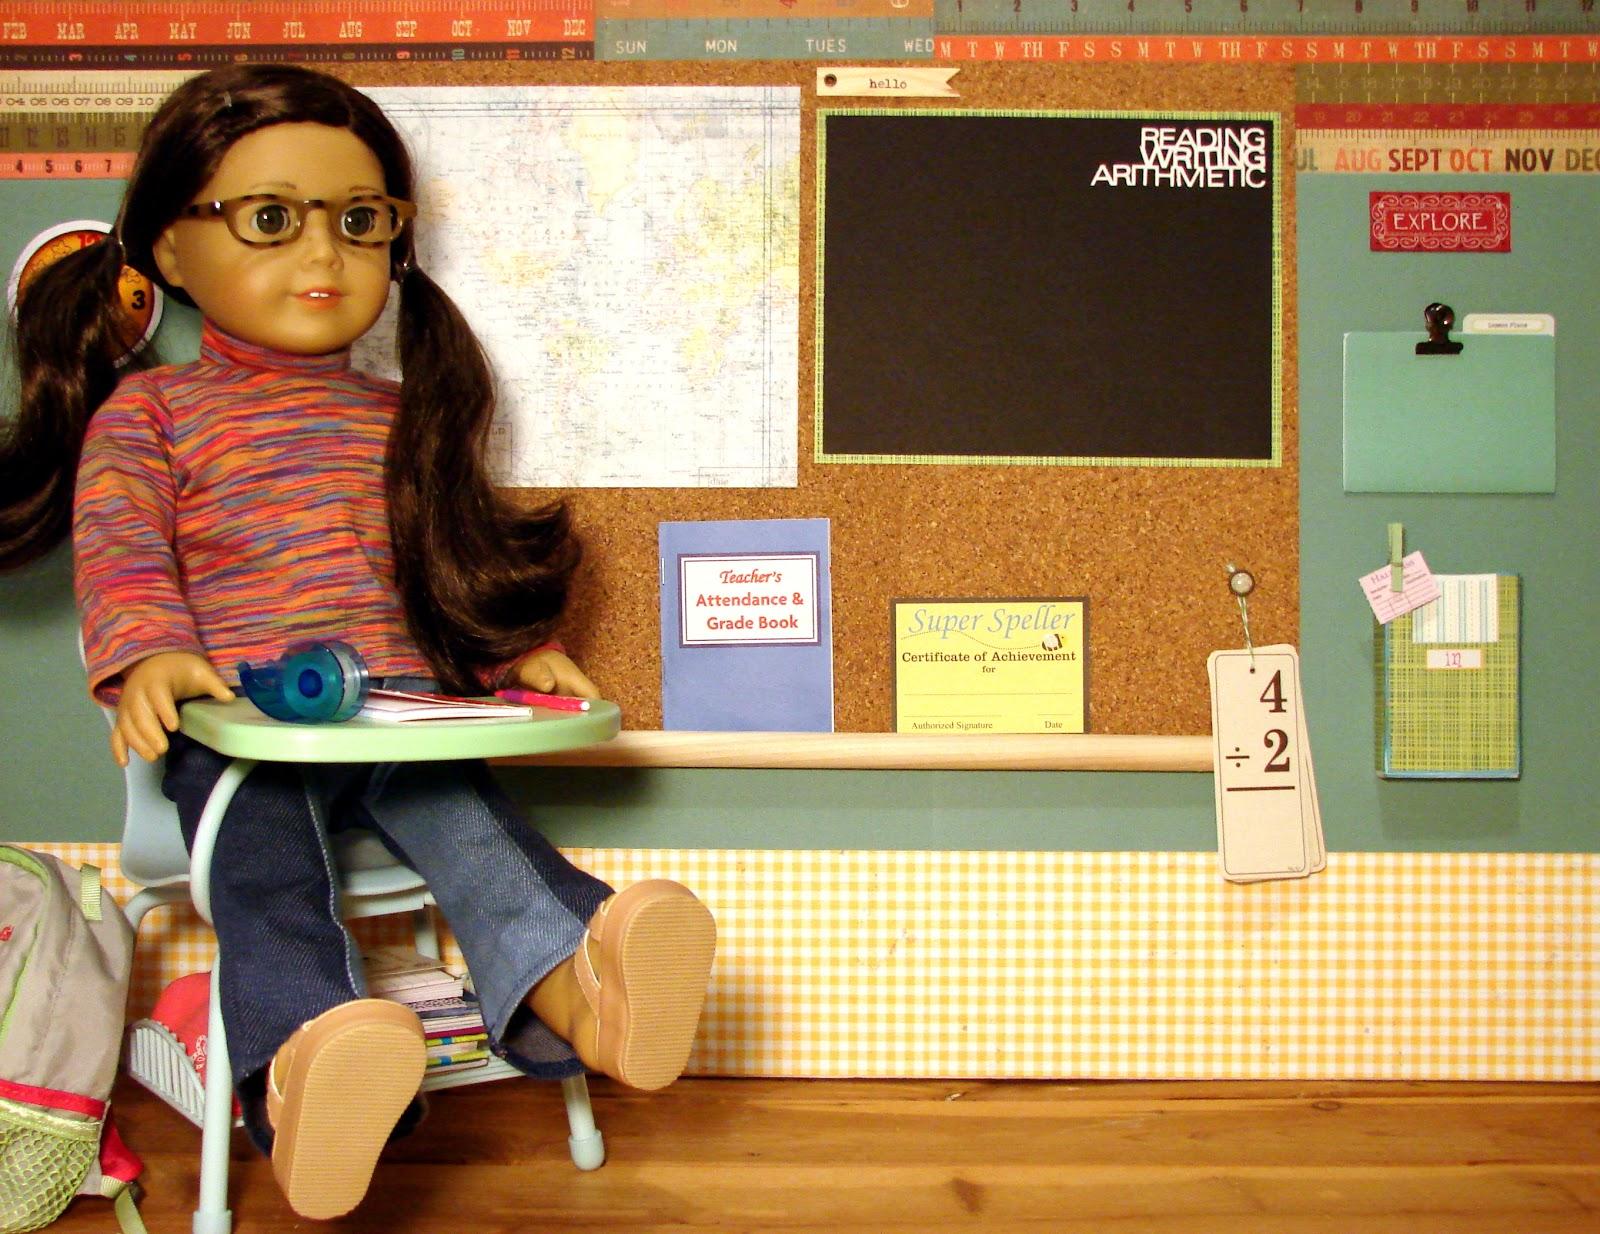 American Girl Doll Play Creating A Doll Classroom